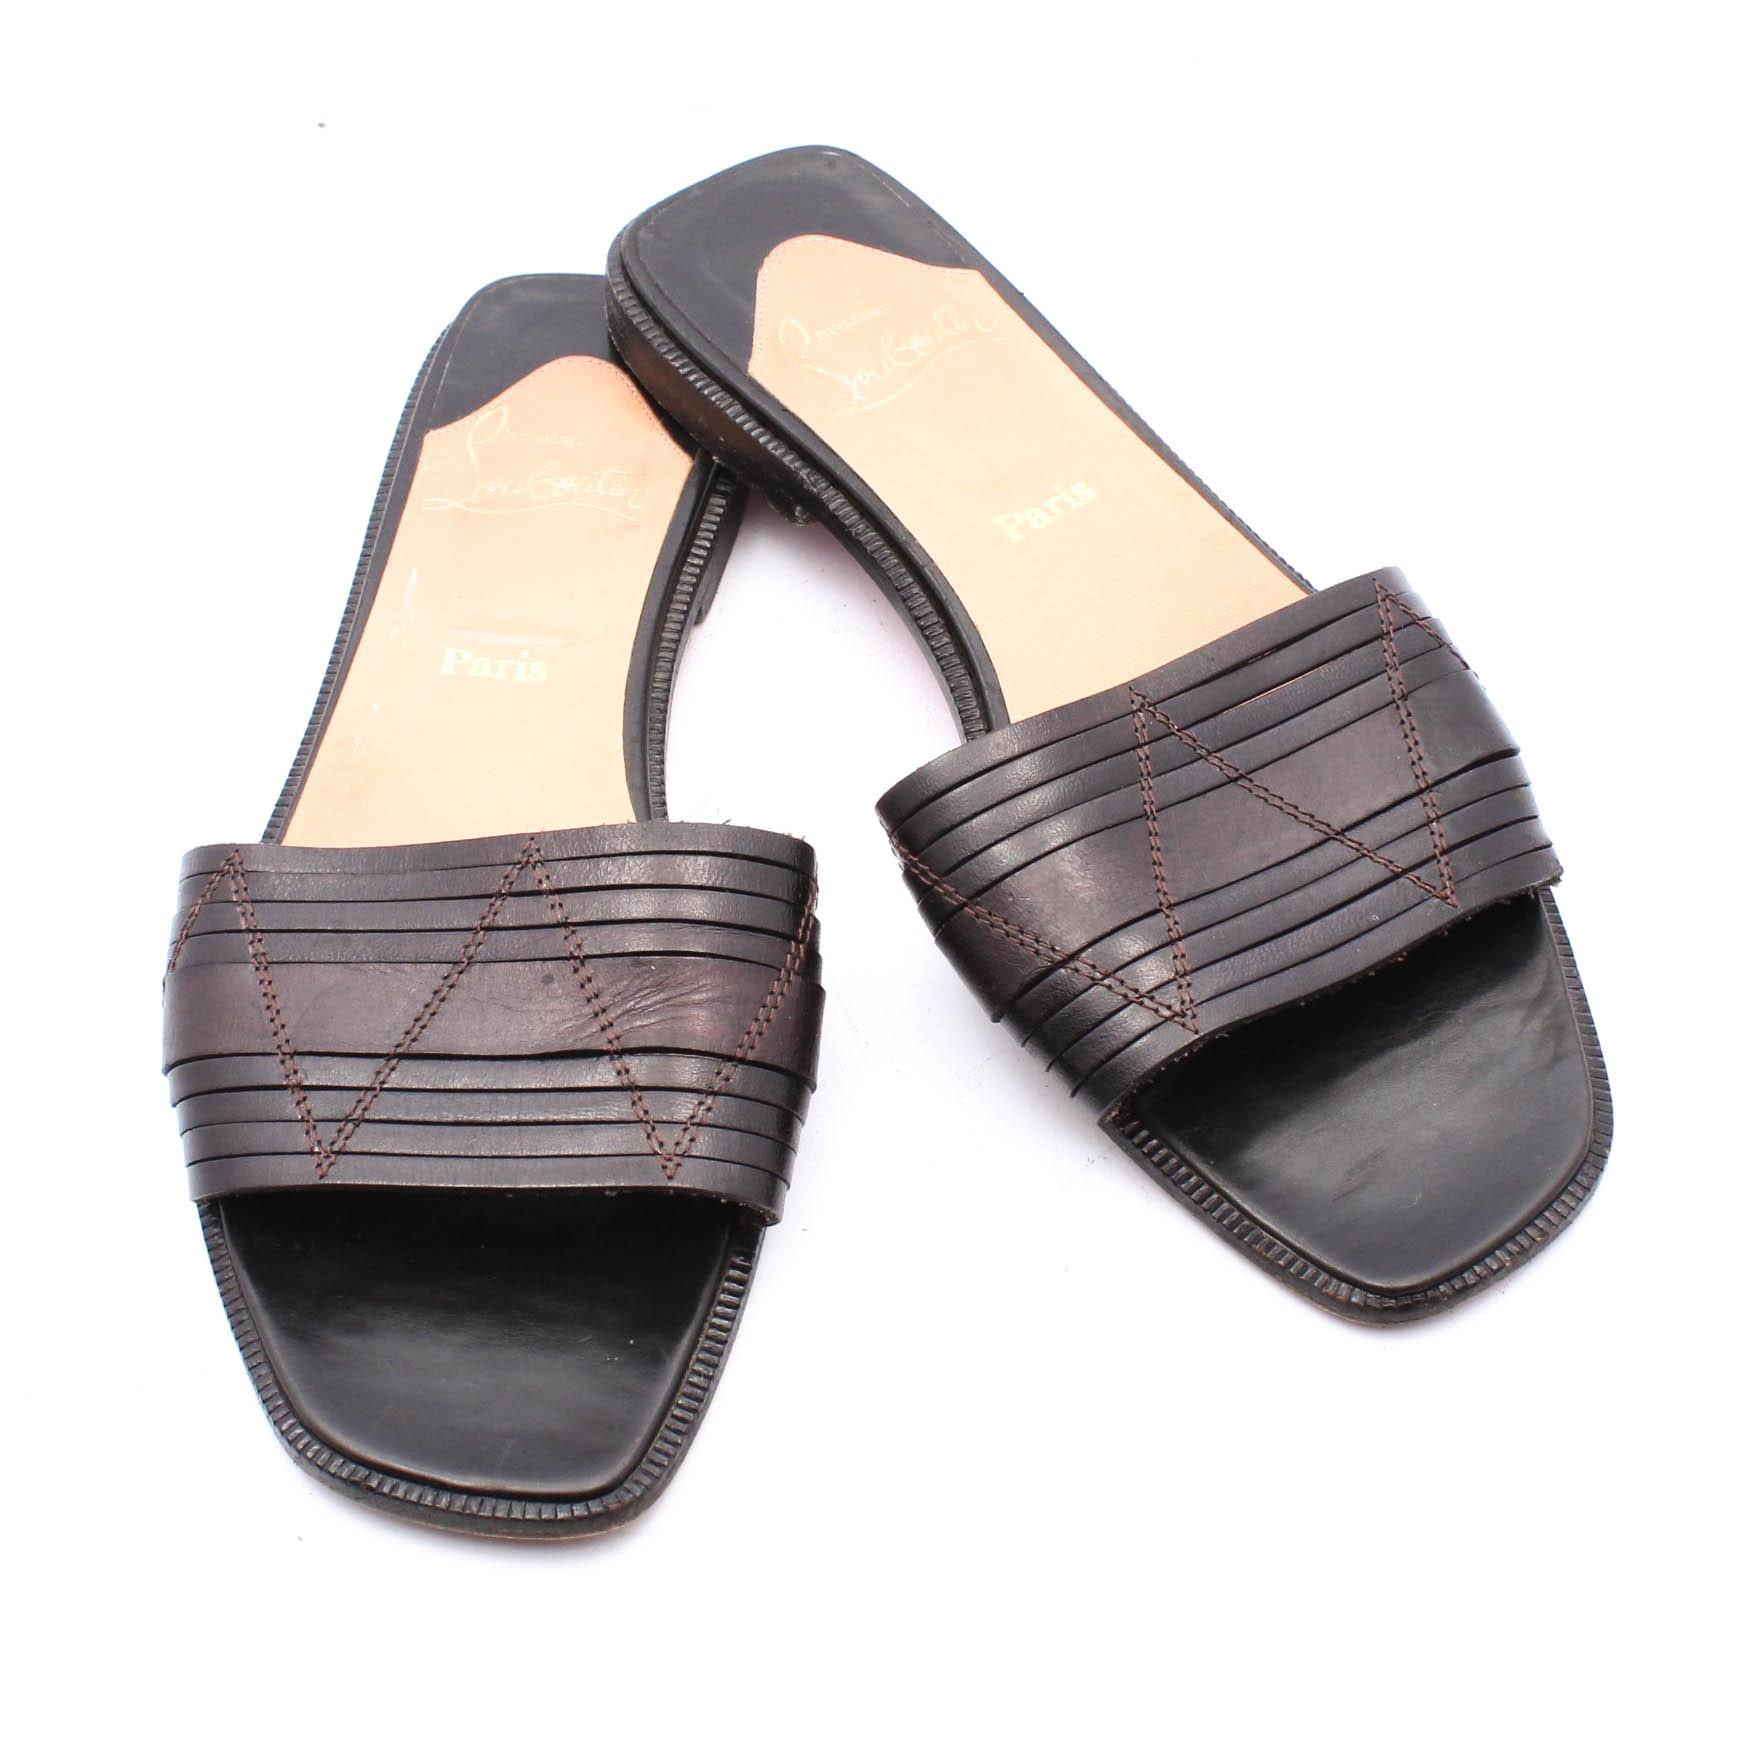 Christian Louboutin of Paris Black Leather Slide Sandals